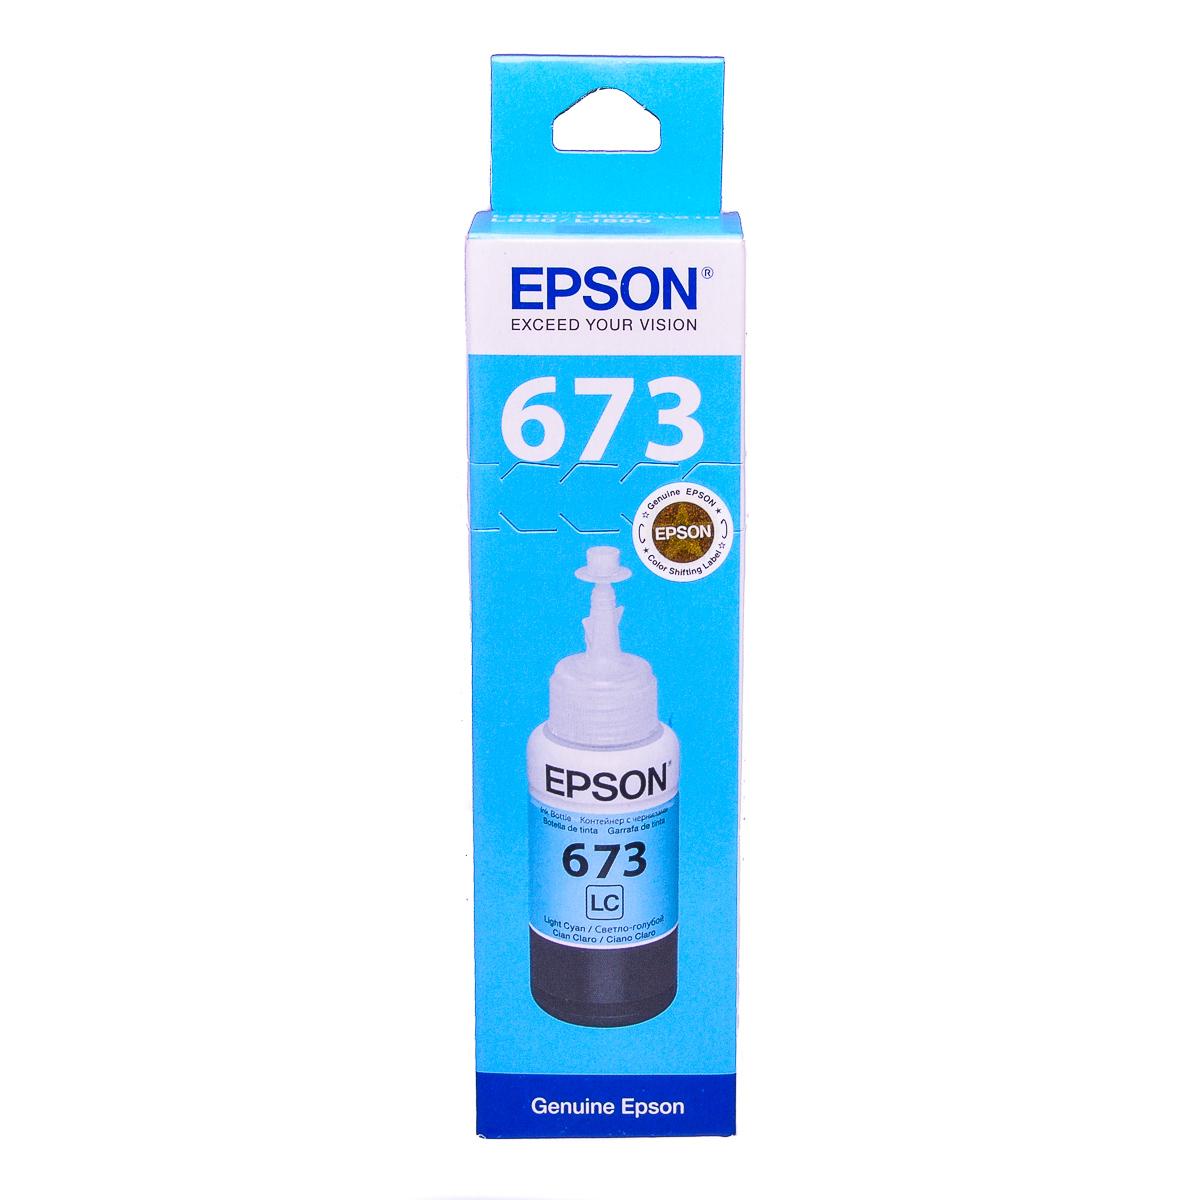 Epson T6735 Light Cyan original dye ink refill Replaces Stylus PX800FW